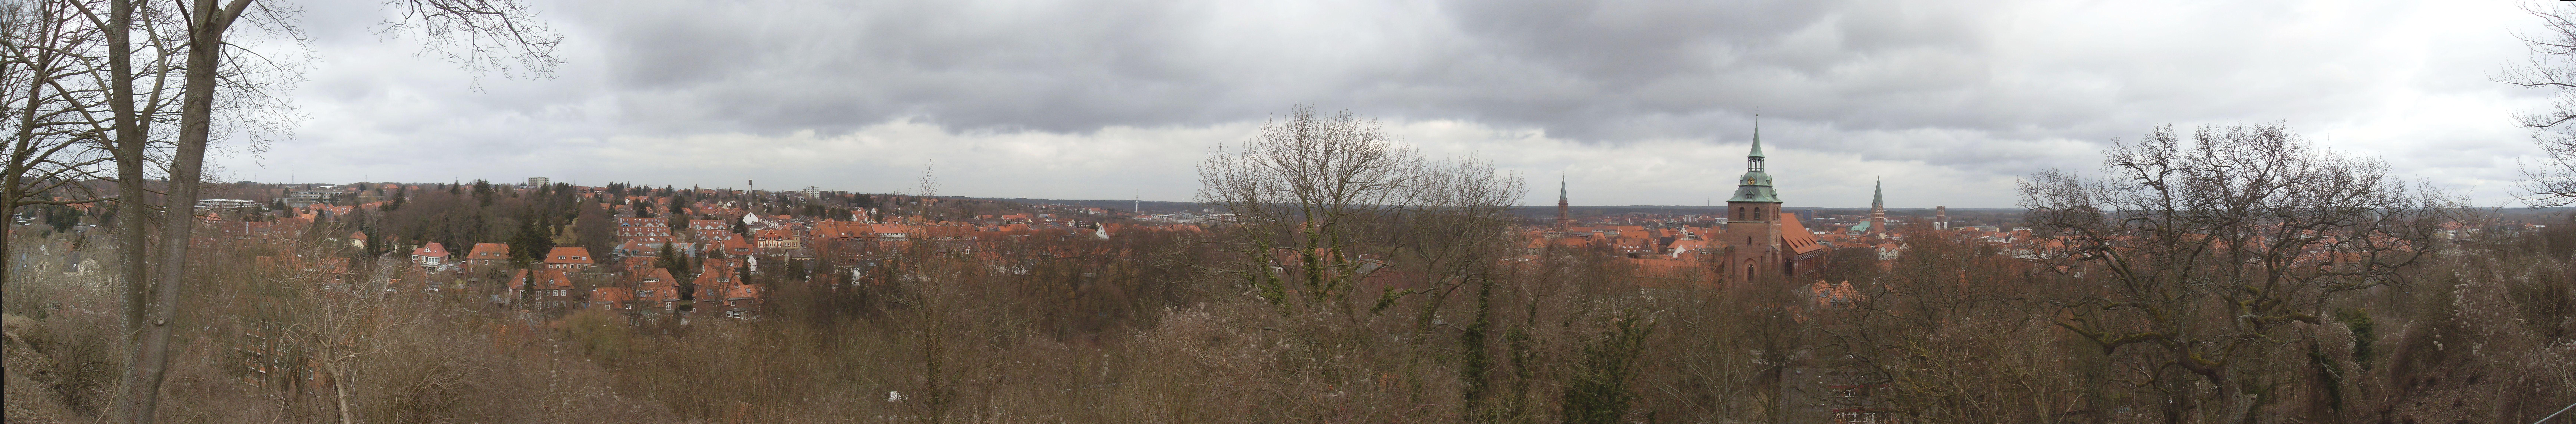 Panorama vom Kalkberg über Lüneburg, März 2010